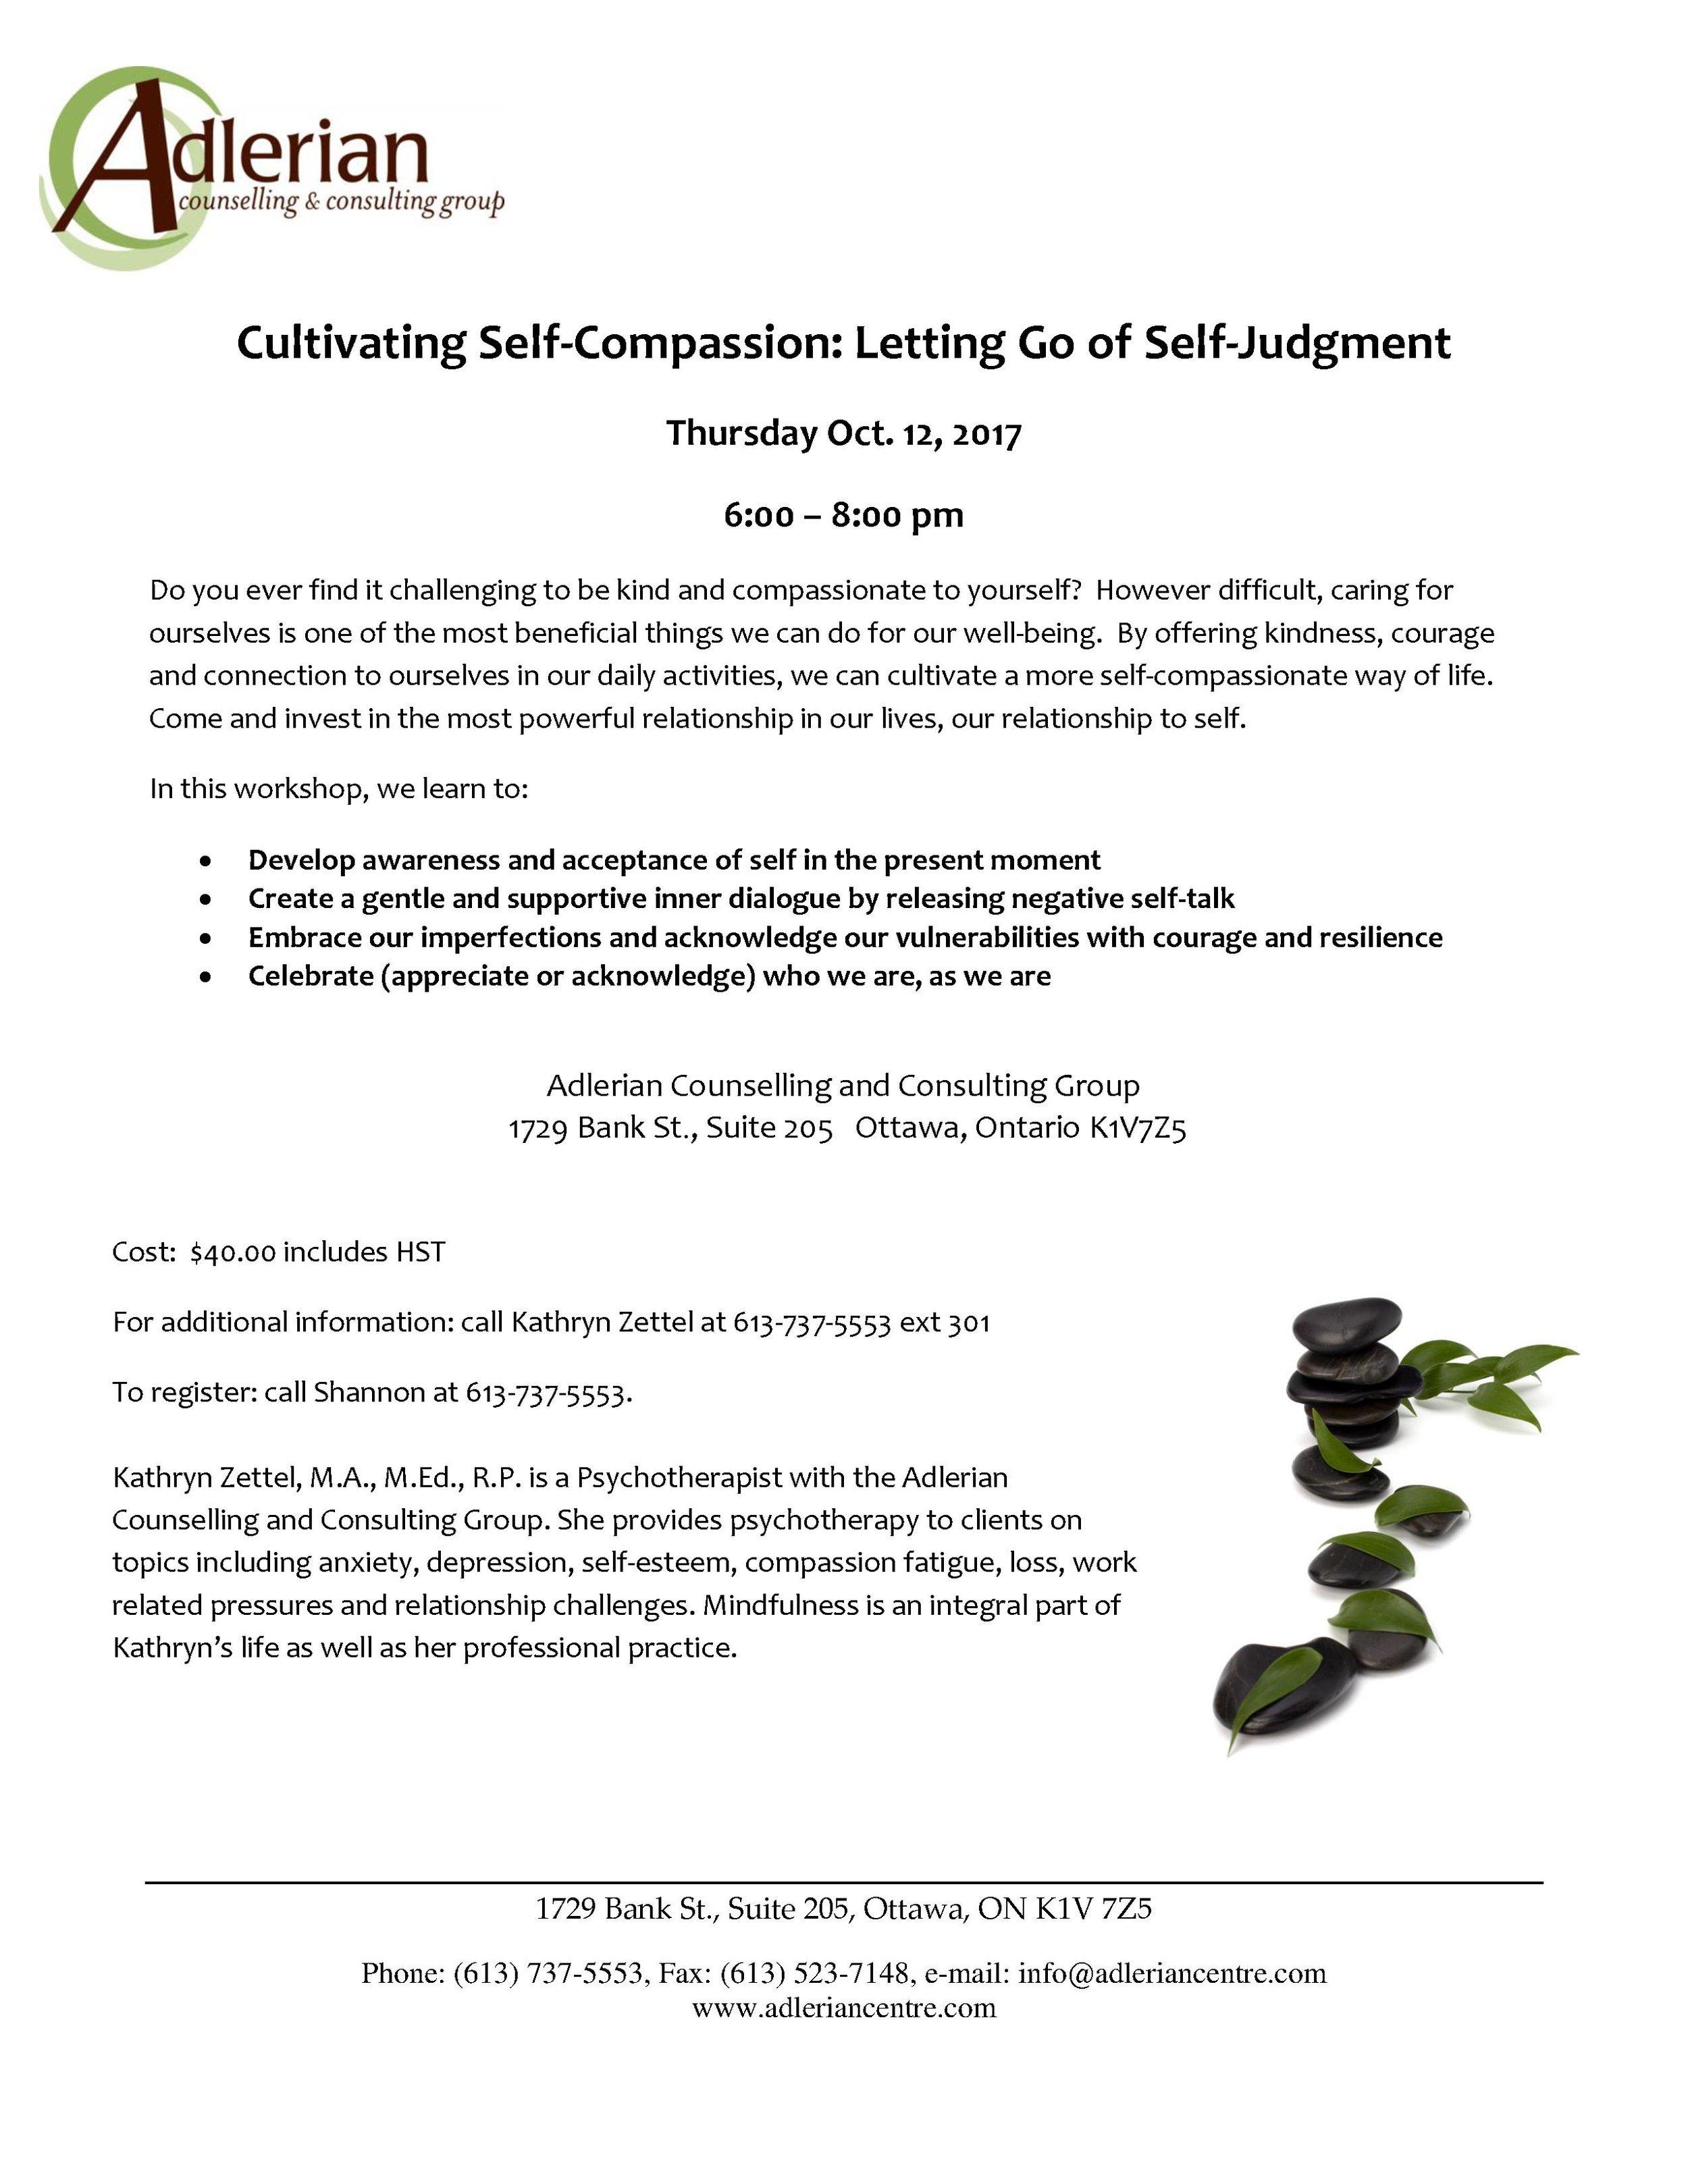 SelfCompassion_Sept2017.jpg